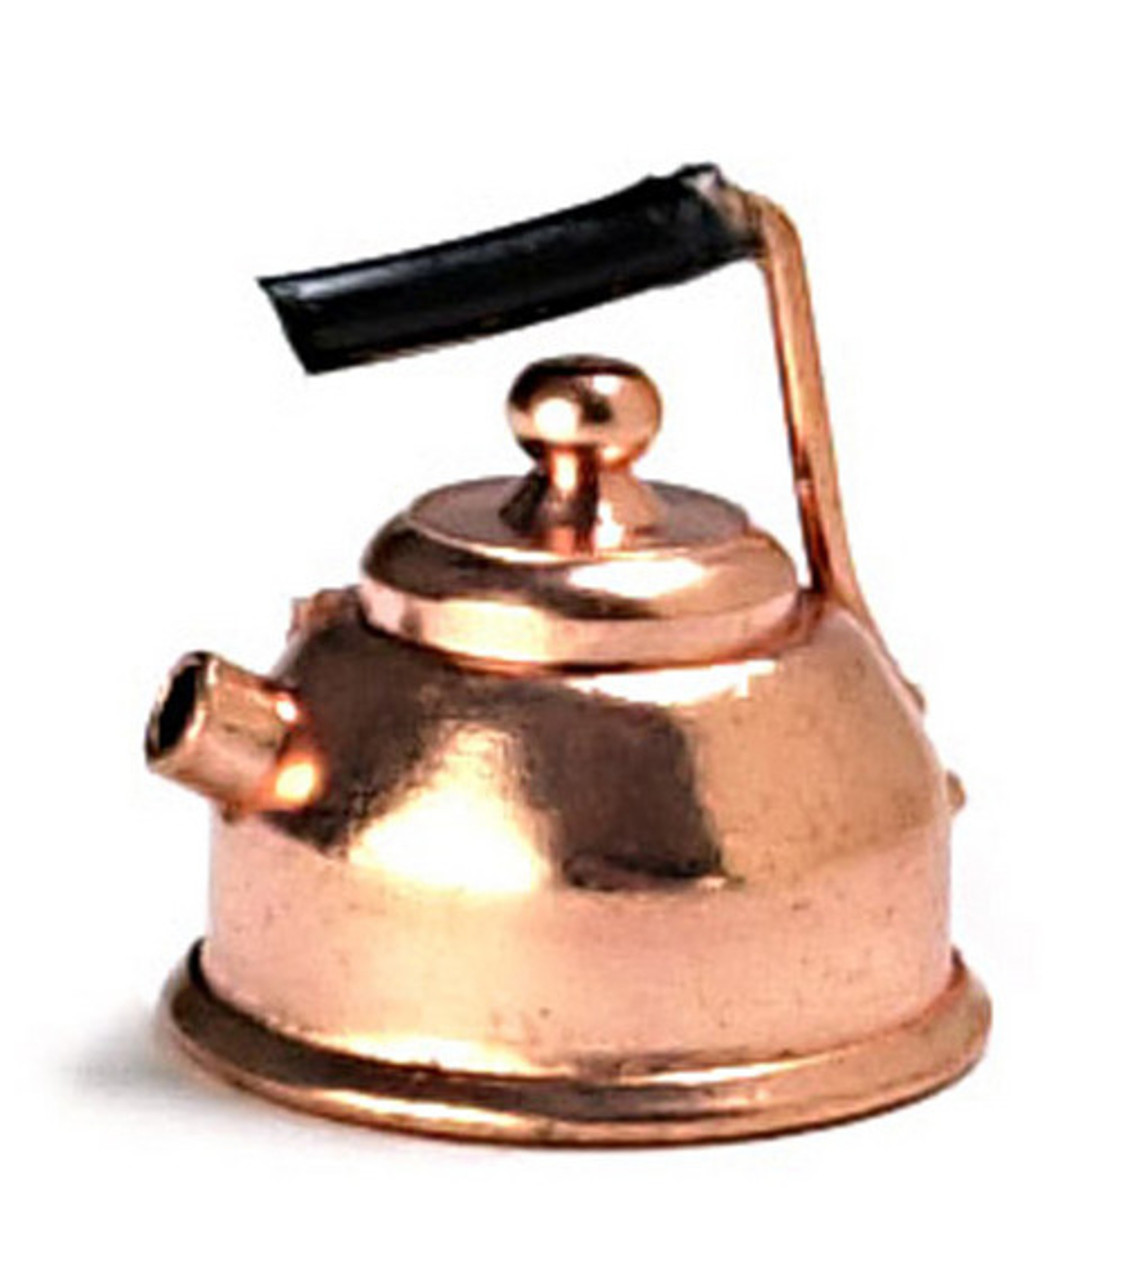 Dollhouse City - Dollhouse Miniatures Copper Teapot